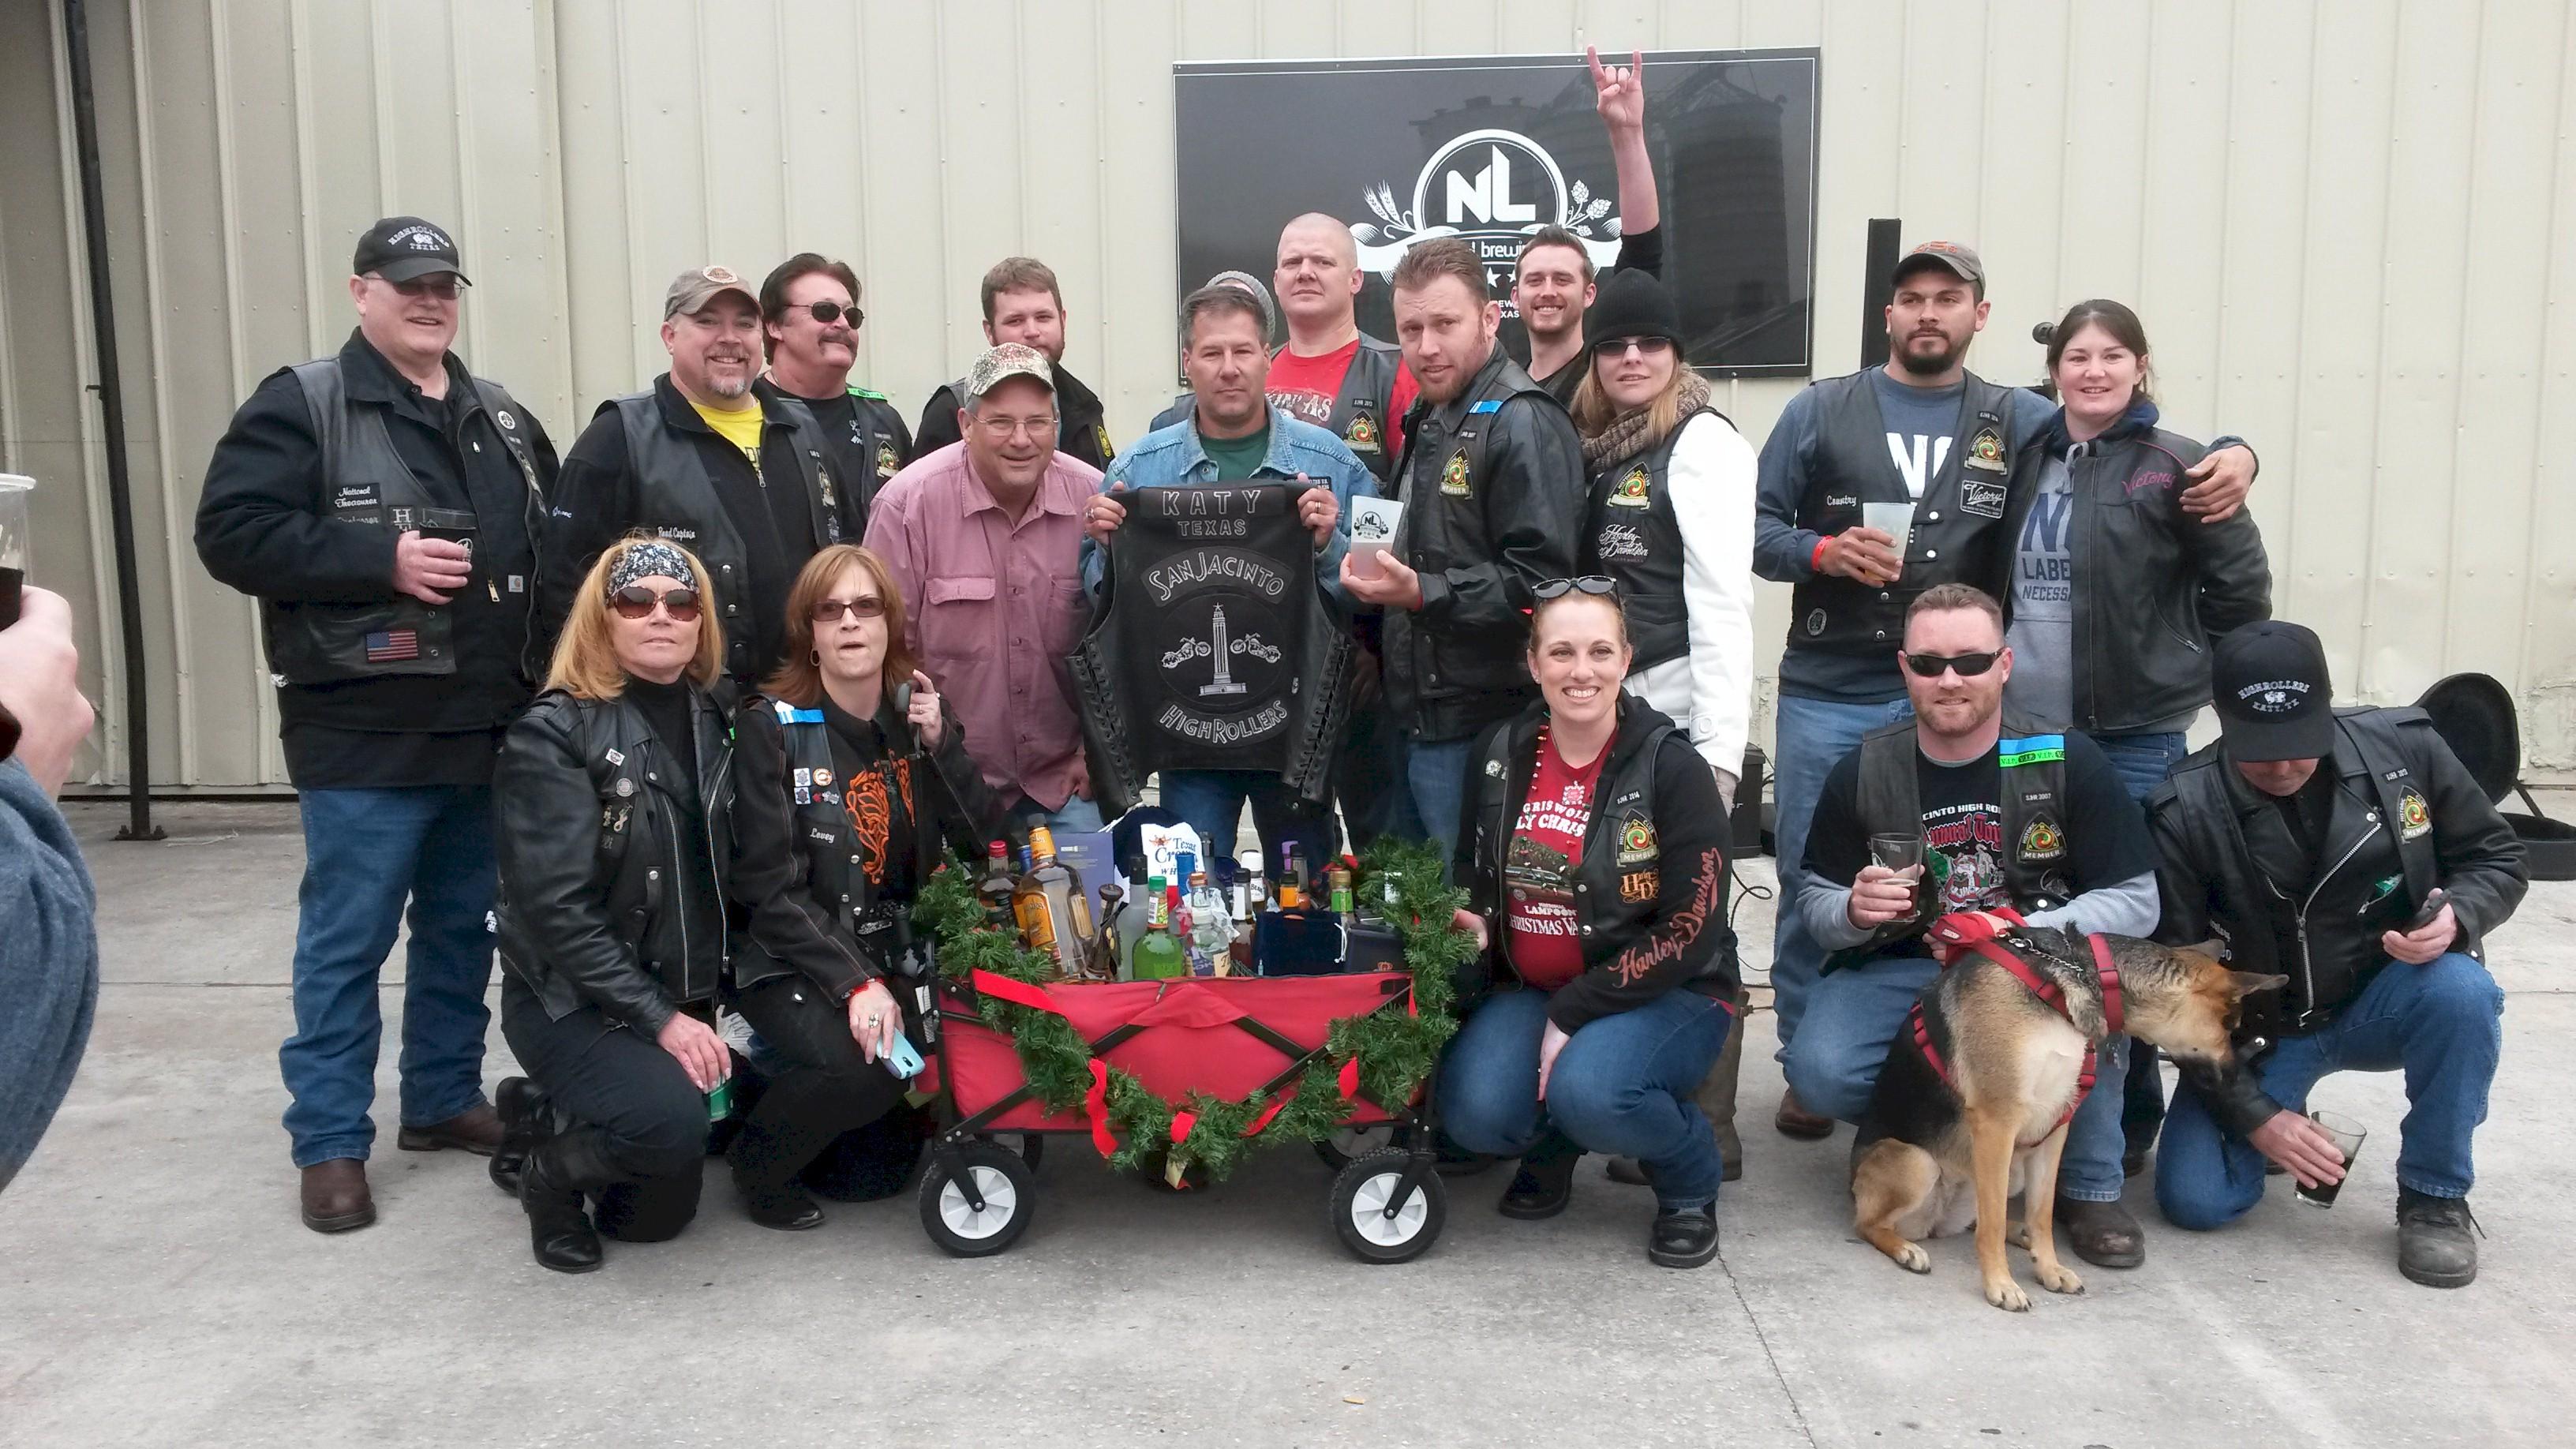 SJHRMC Liquor Wagon Raffle – December 2014 | San Jacinto High Rollers MC - Katy Chapter